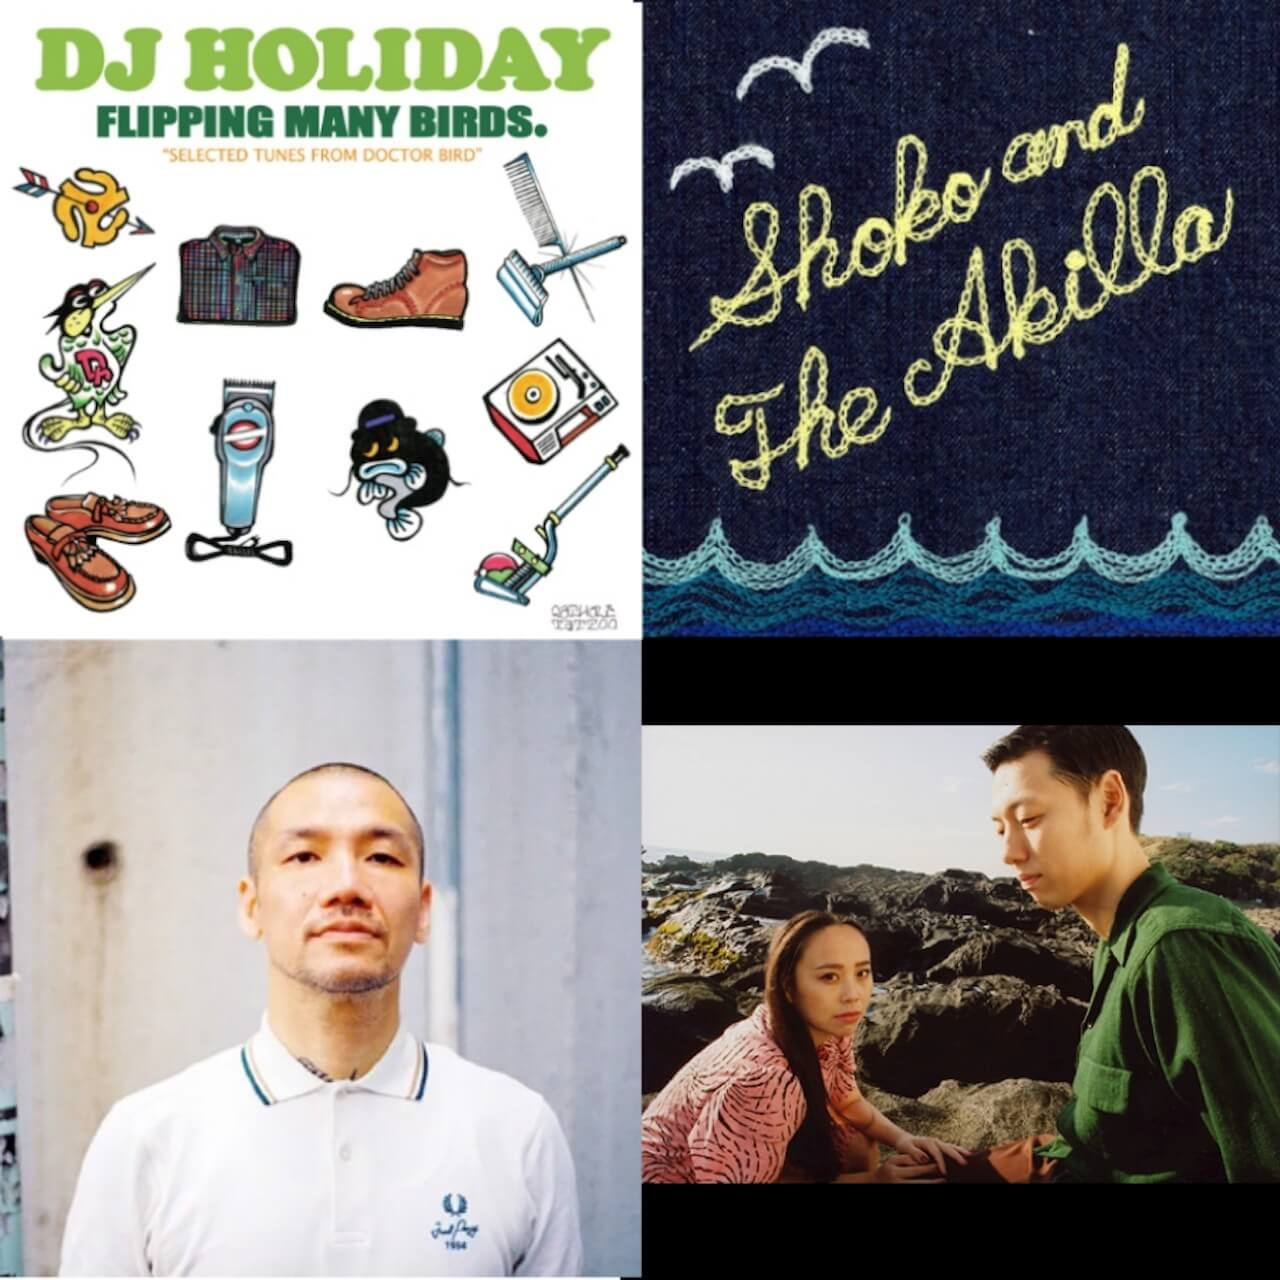 Shoko & The Akilla、本日リリースの1stアルバムからVIDEOTAPEMUSICが手掛けた「Earthy Smells」MVを公開 music200812-shoko-theakilla